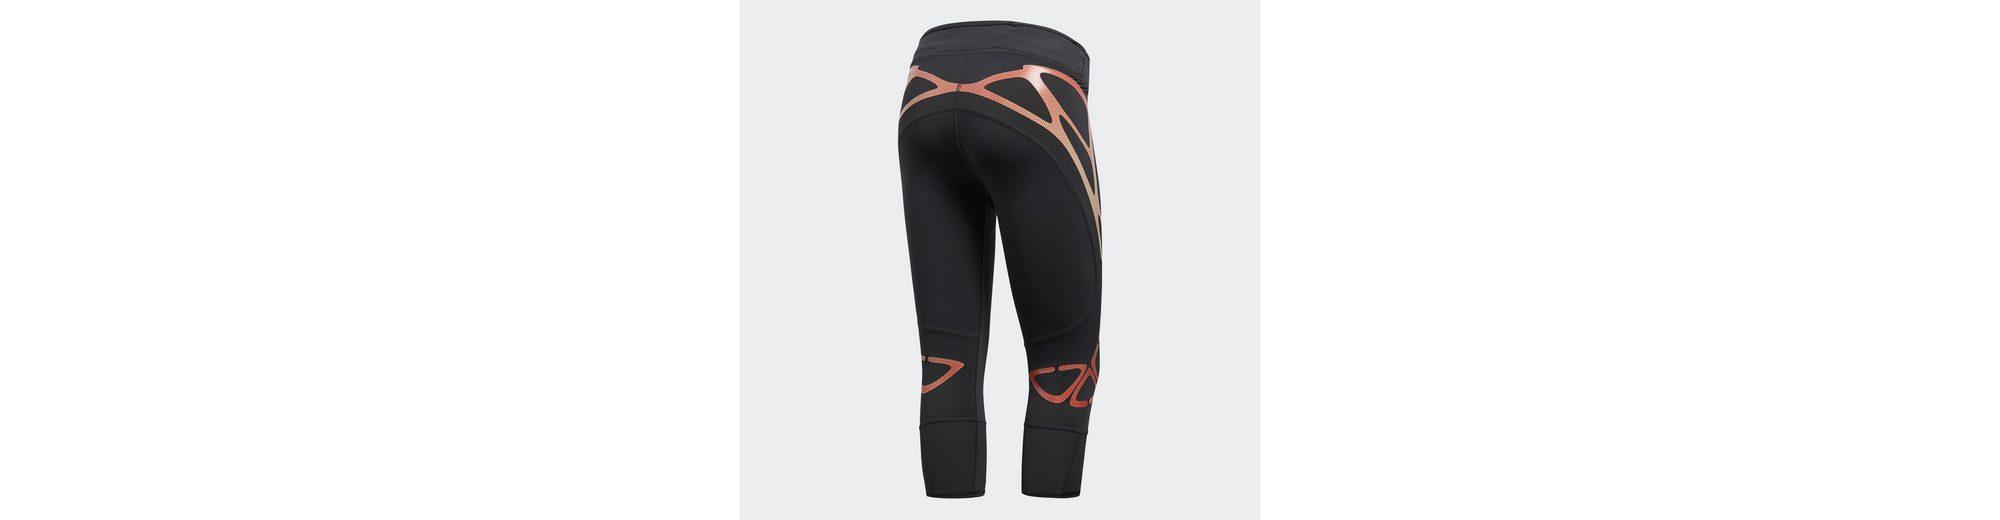 adidas Performance Leggings Adizero Sprintweb 3/4-Tight Steckdose Online XrMd5b9B